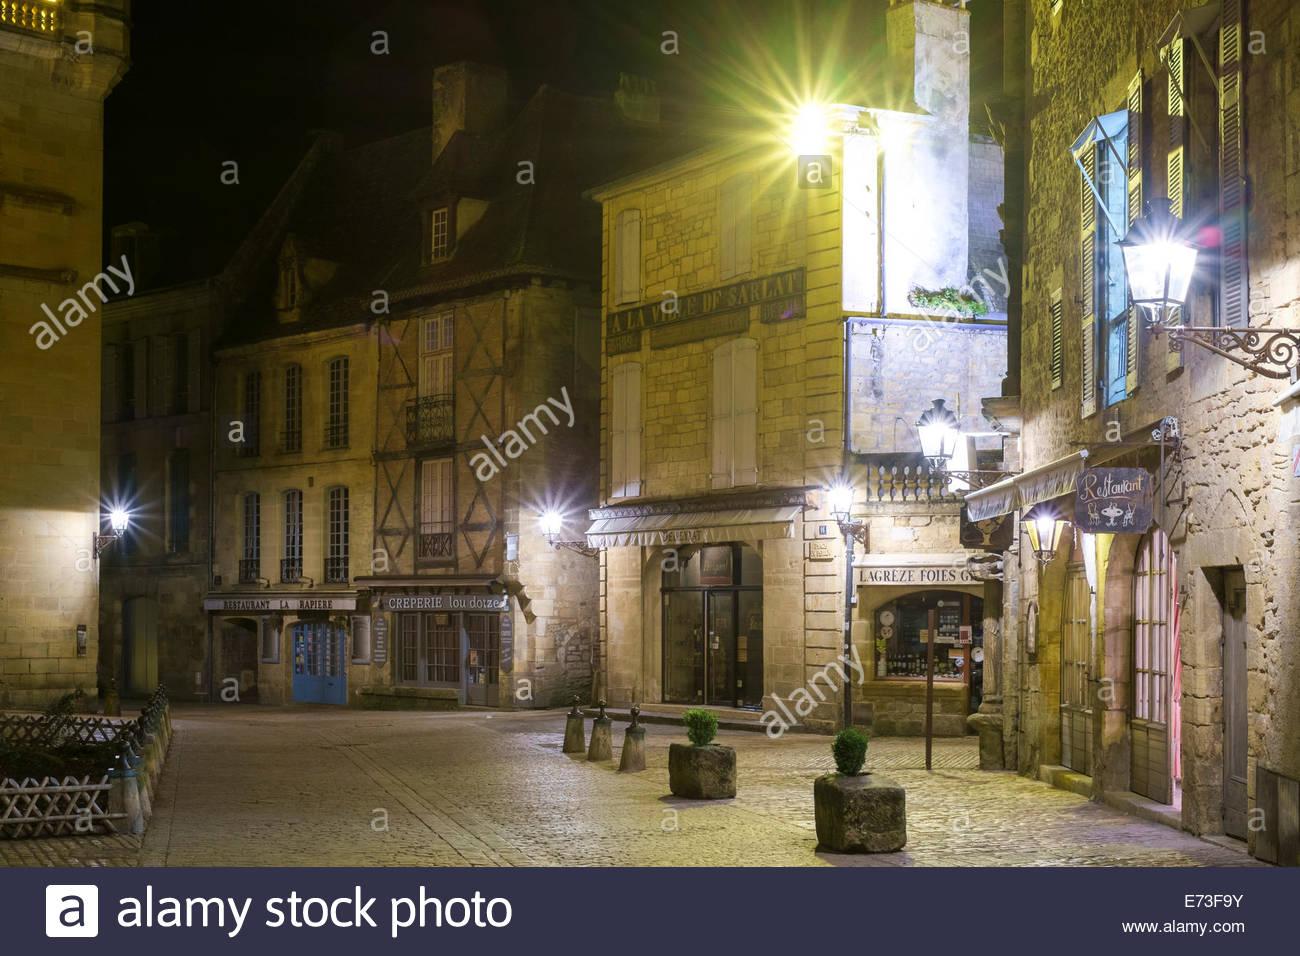 Old buildings on Place du Peyrou at night, Sarlat-la-Canéda, Dordogne Department, Aquitaine, France Stock Photo